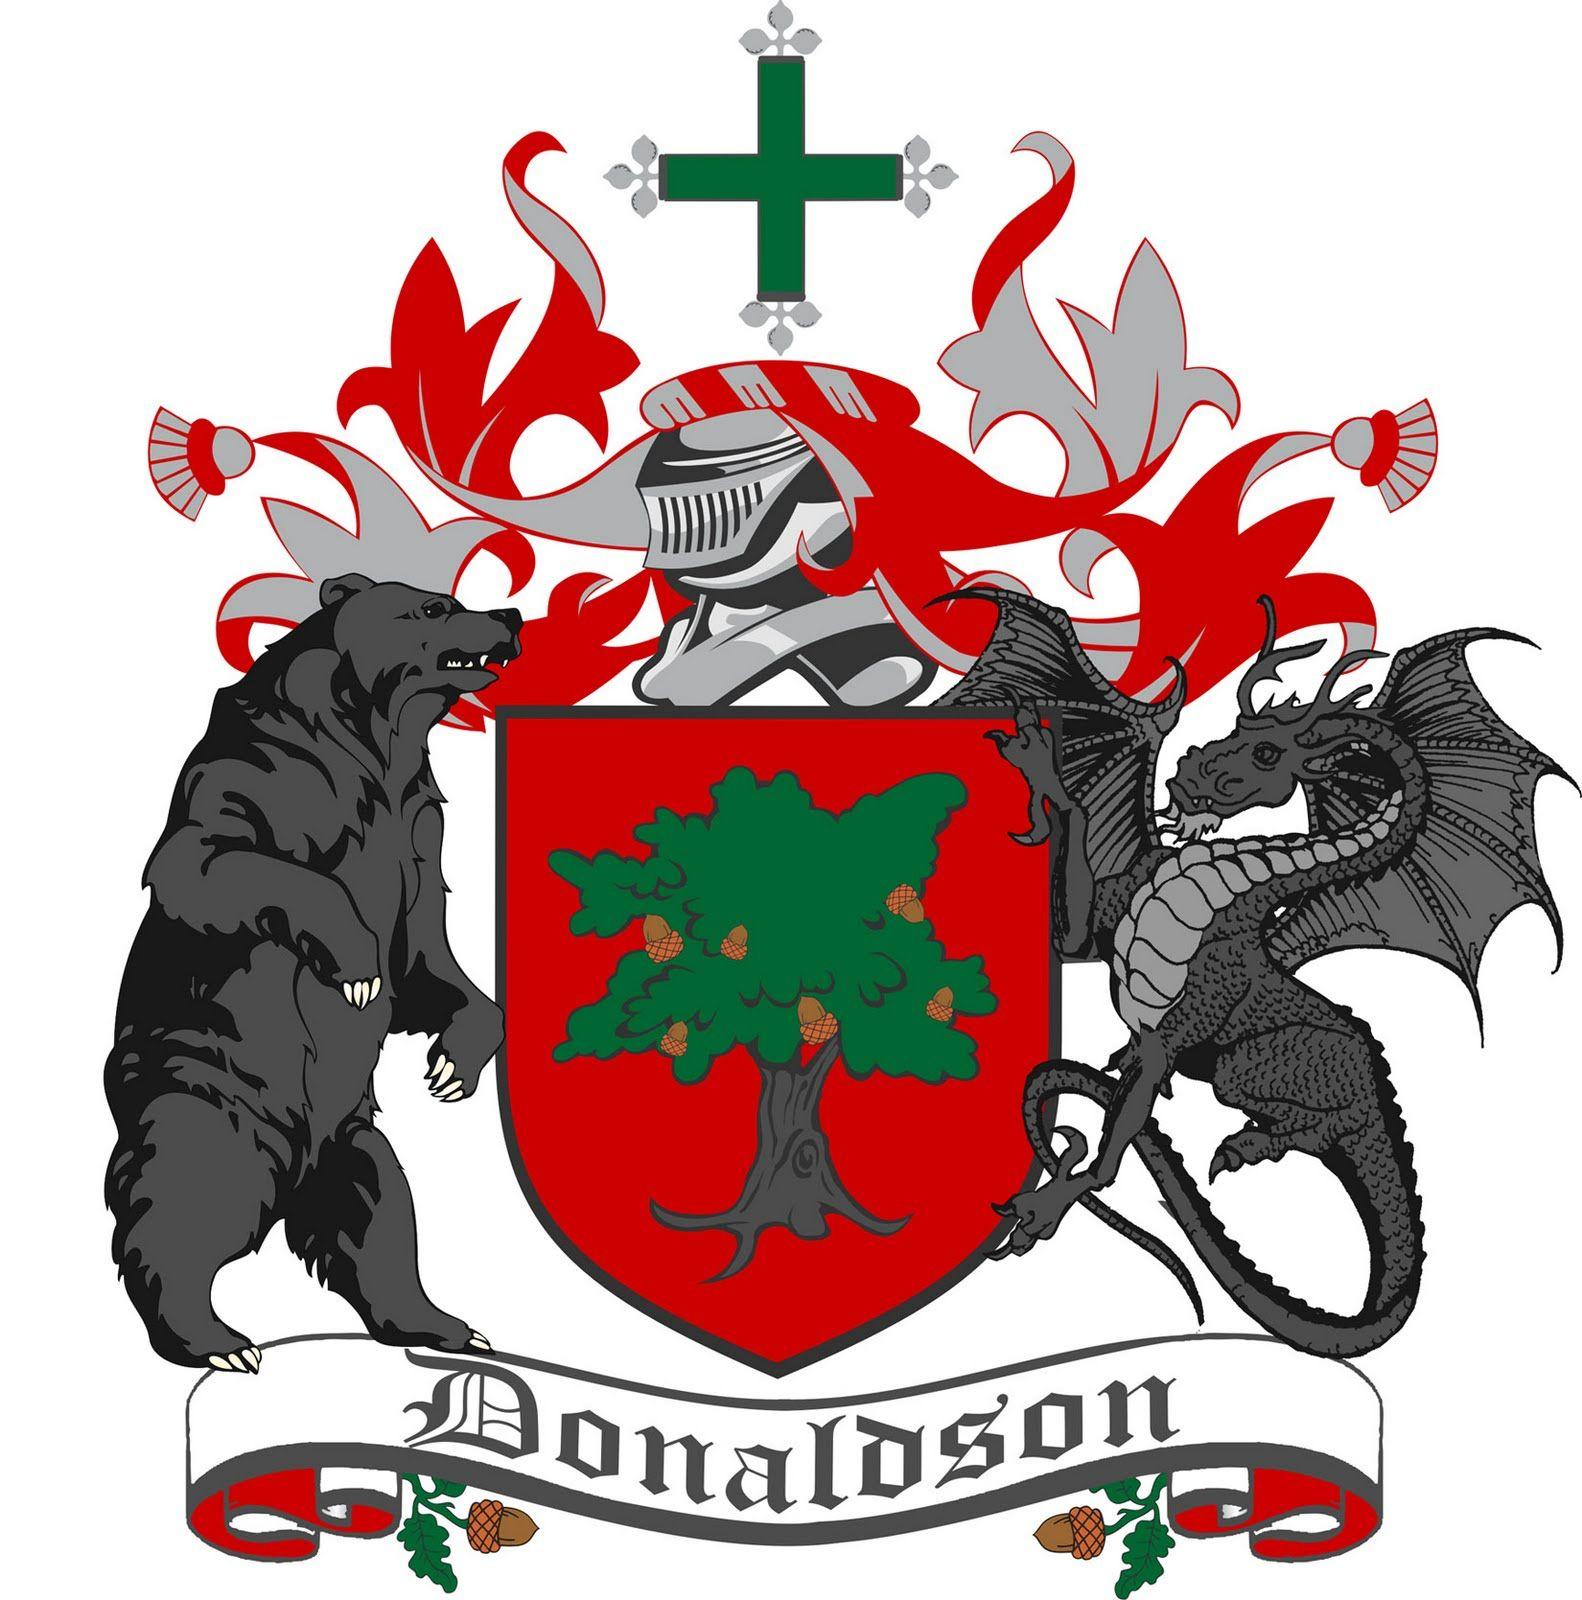 Donaldson crest Vehicle logos, Ferrari logo, Family crest